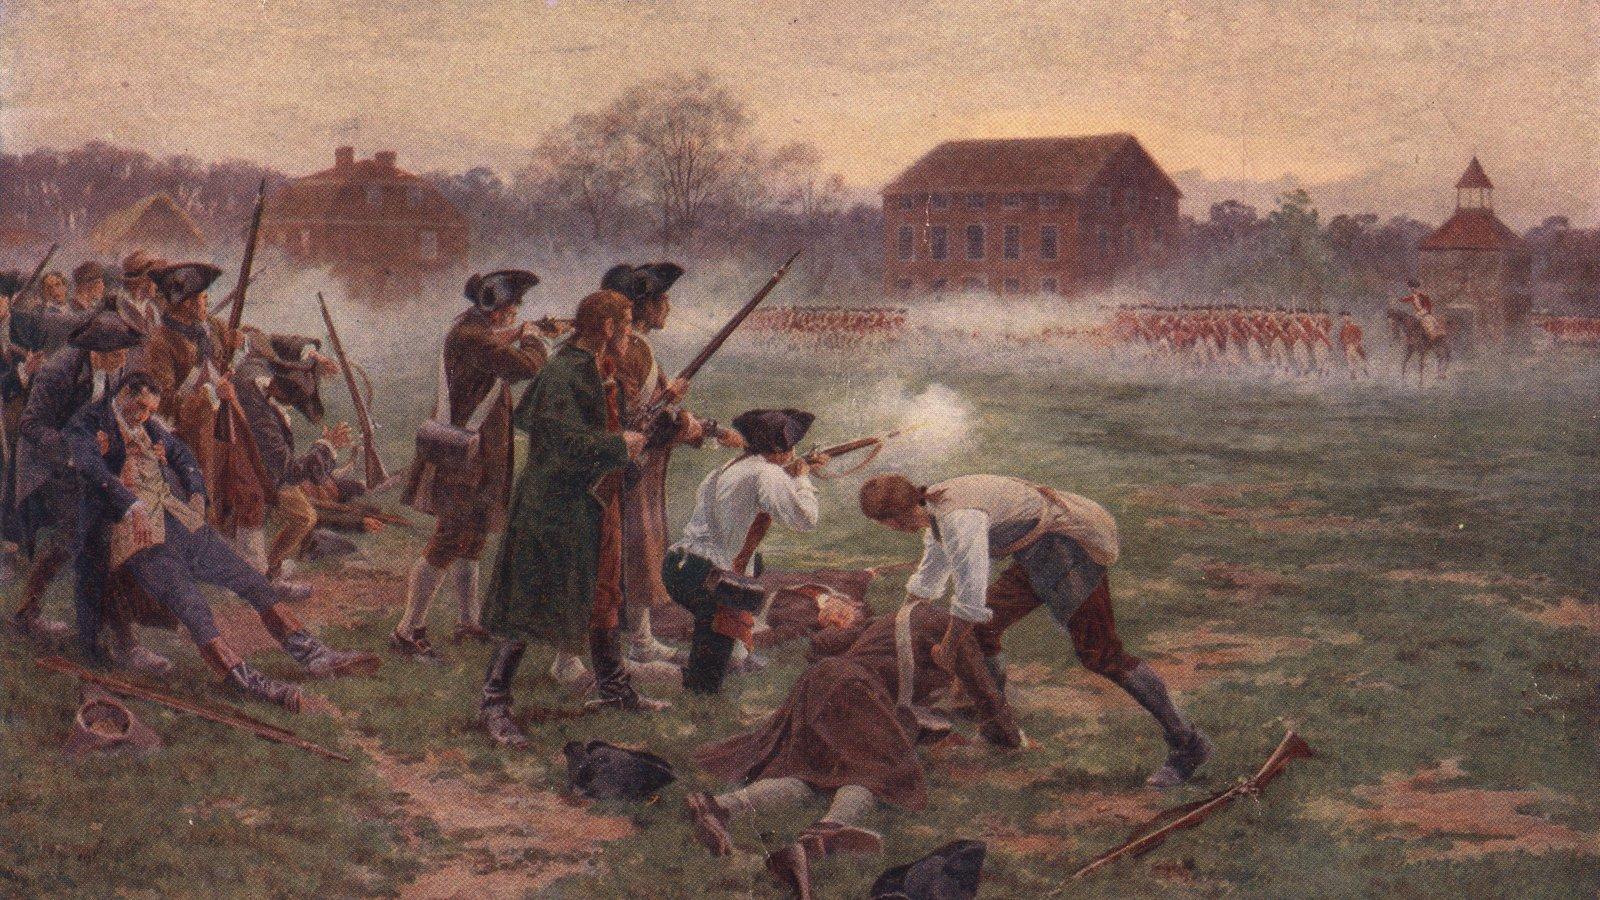 histo-guerre-independance-americaine-lexington